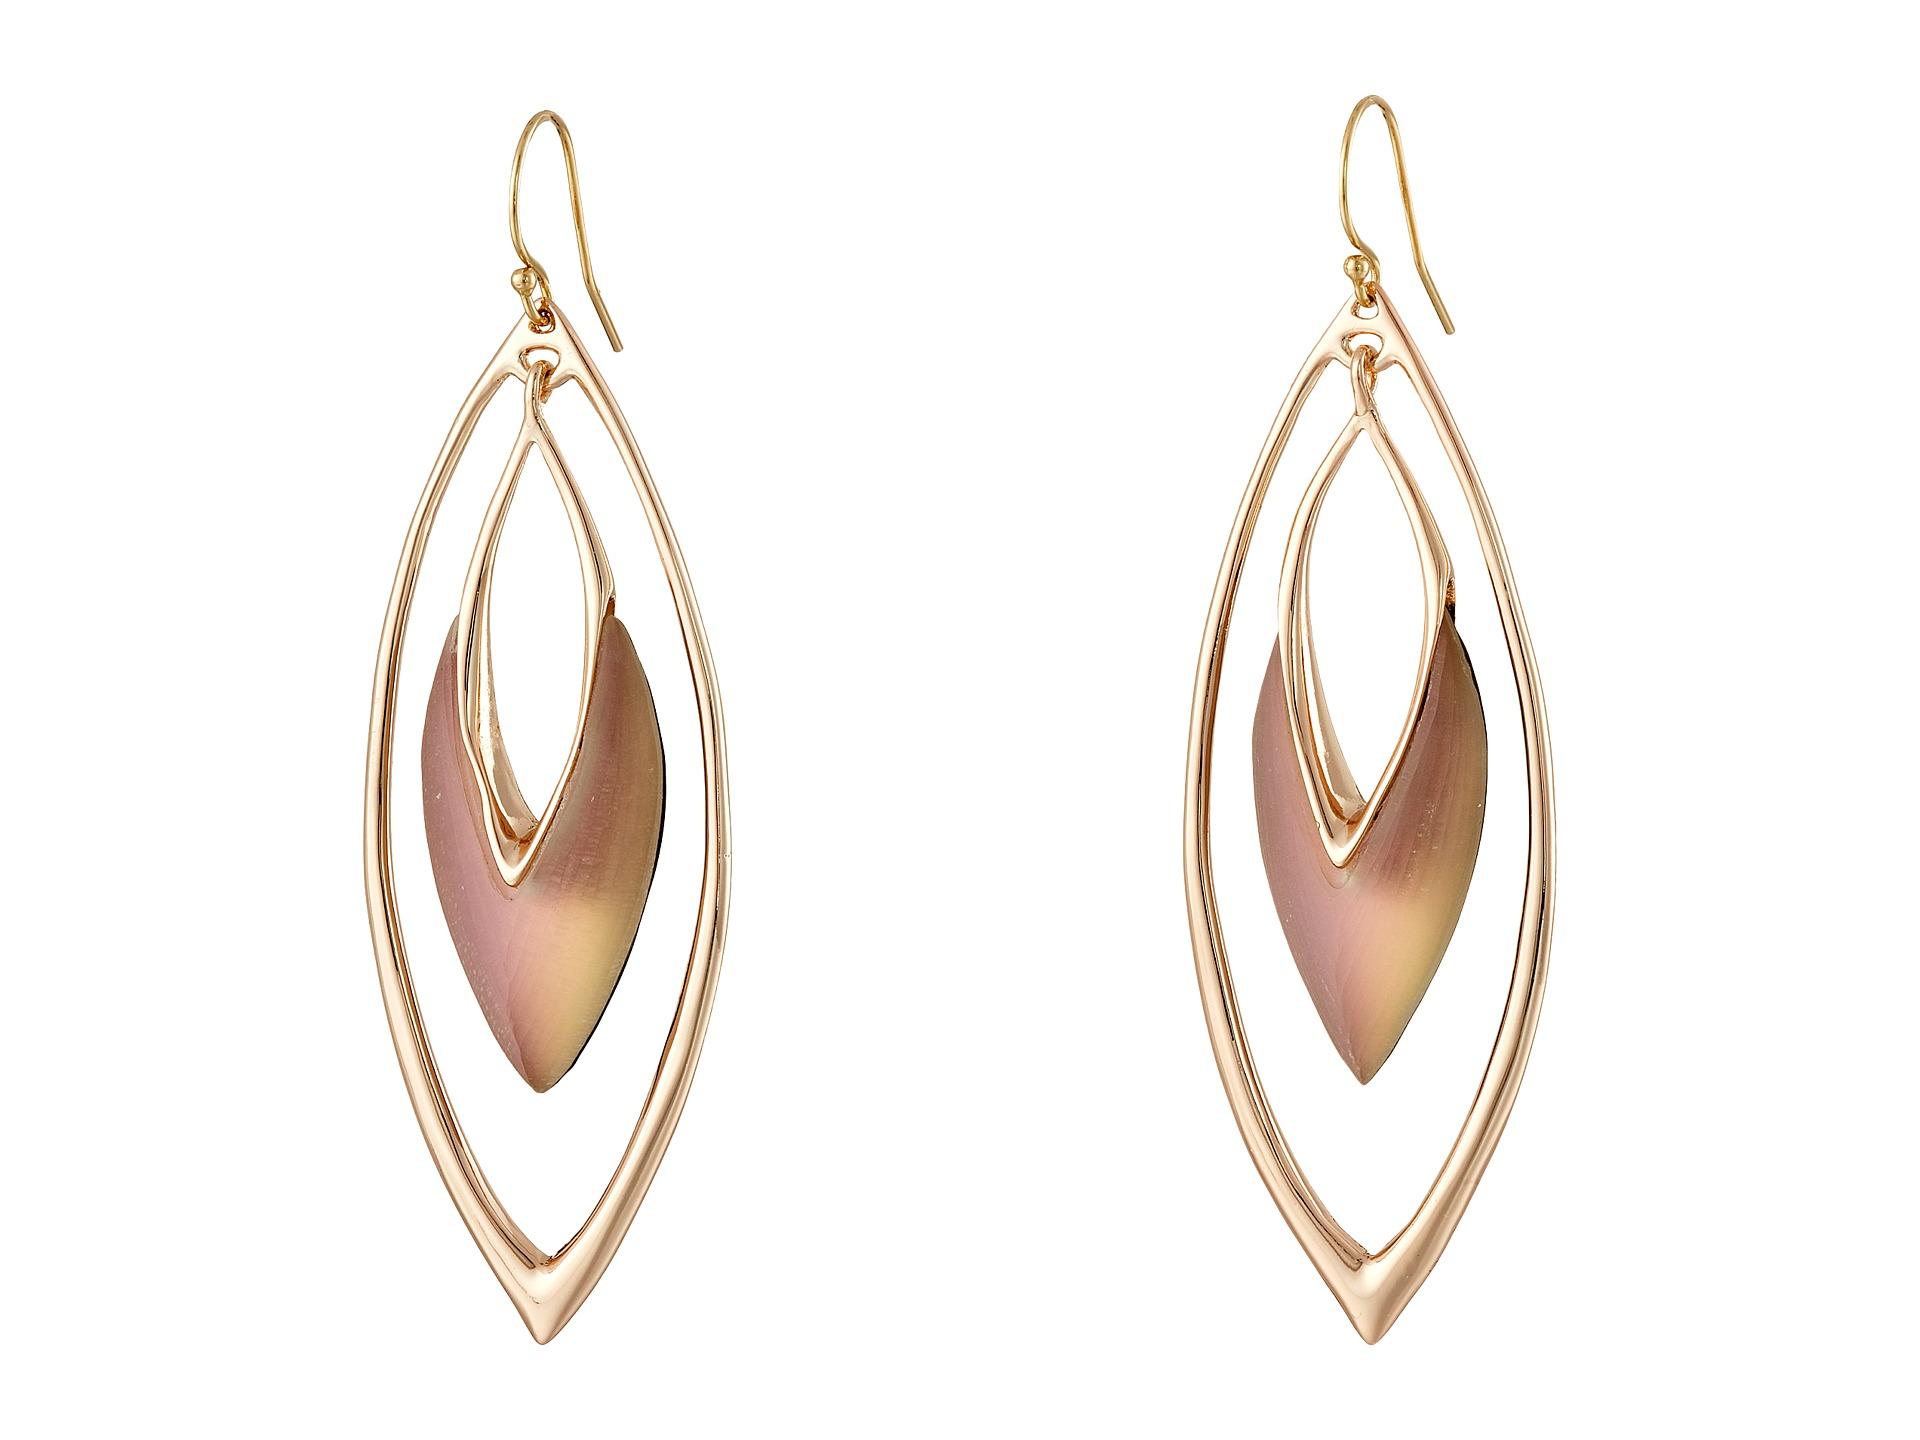 Lyst - Alexis Bittar Orbiting Basic Wire Earrings in Pink